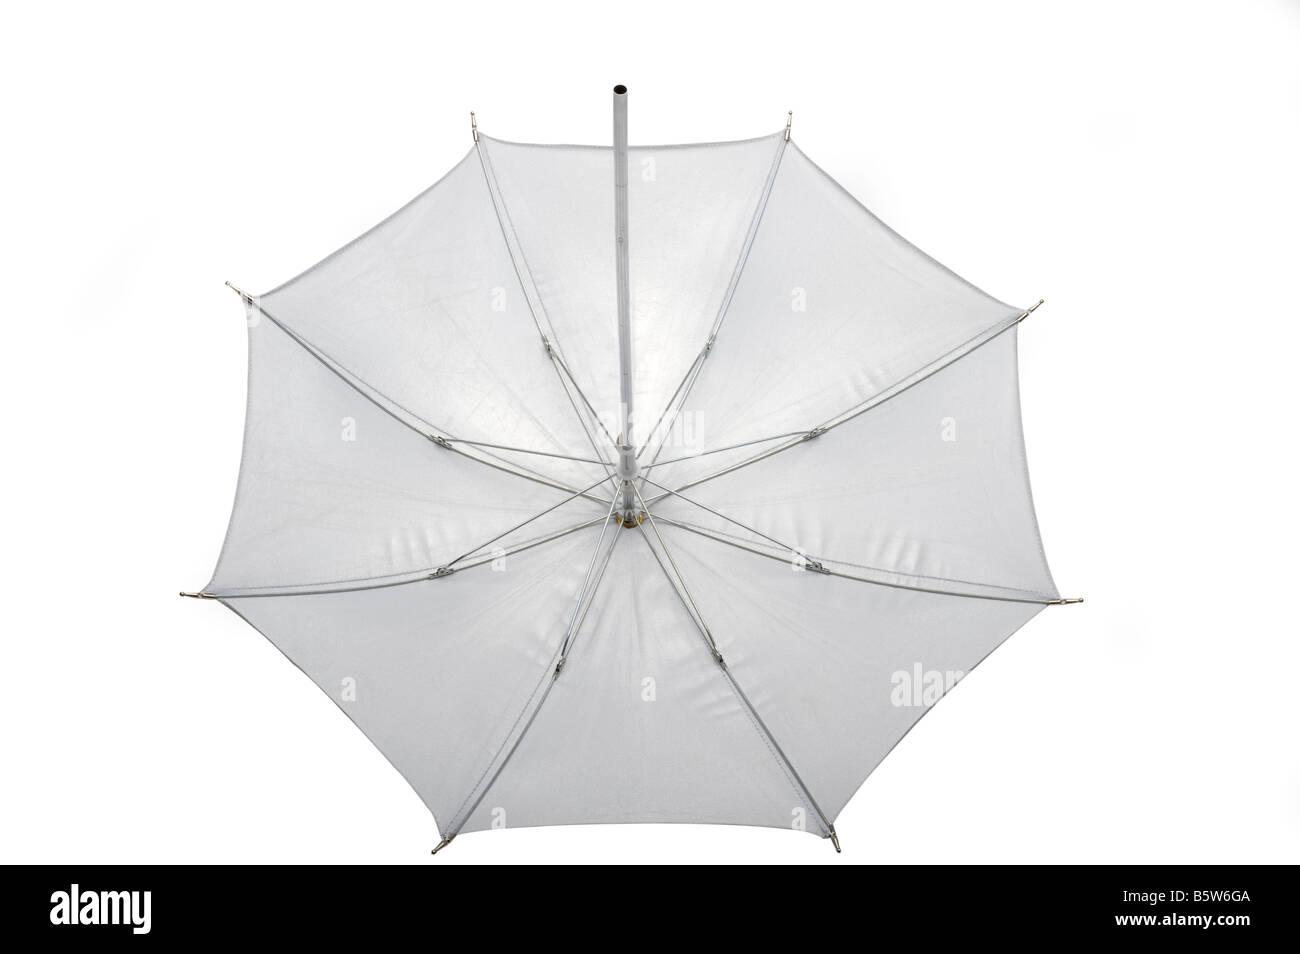 White reflective photographic umbrella - Stock Image